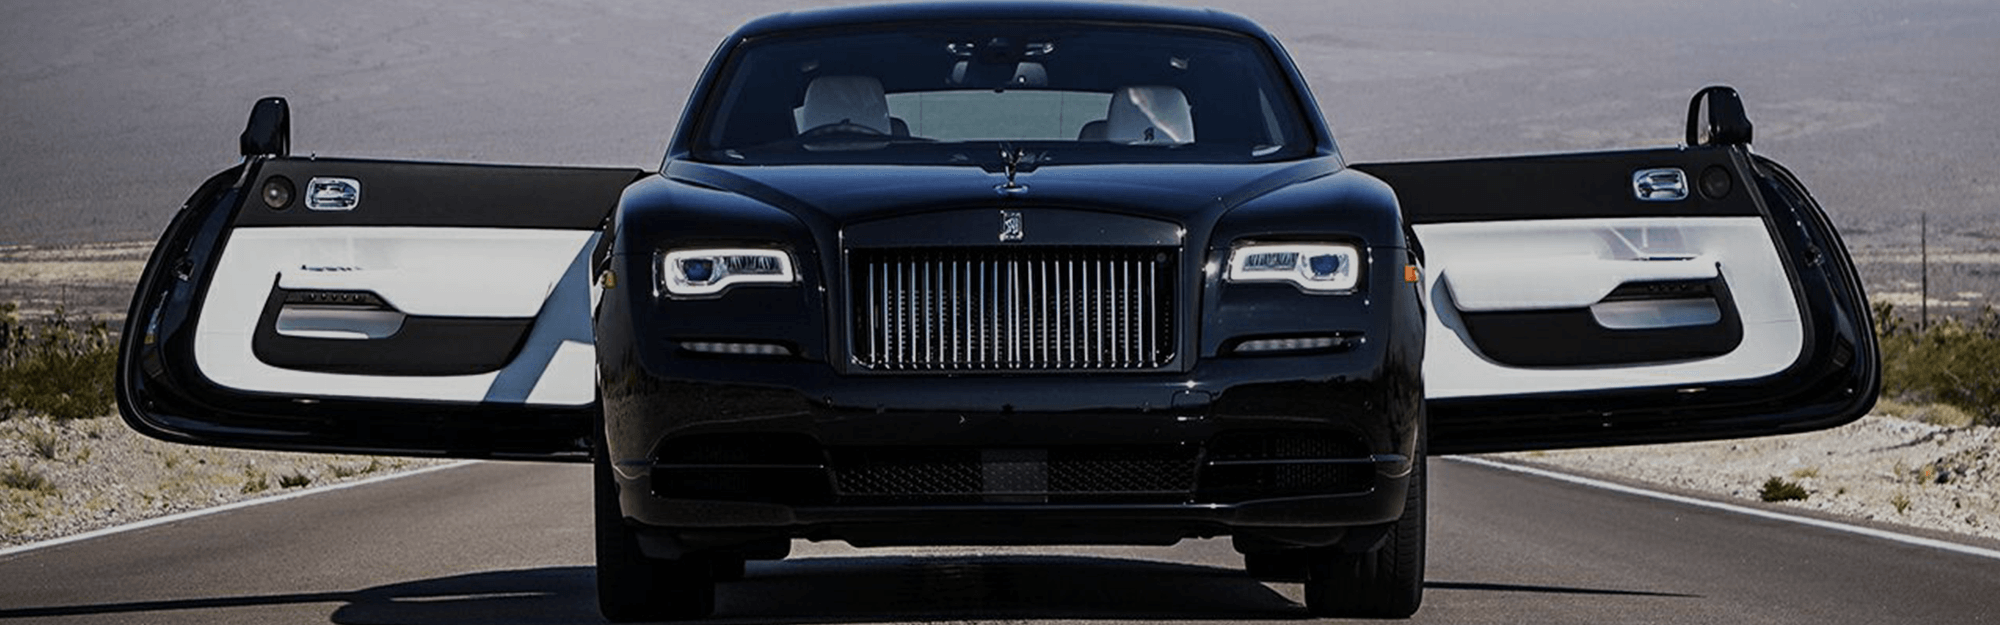 Rolls Royce Wraith Rental in Dubai - CarRentalDXB.COM